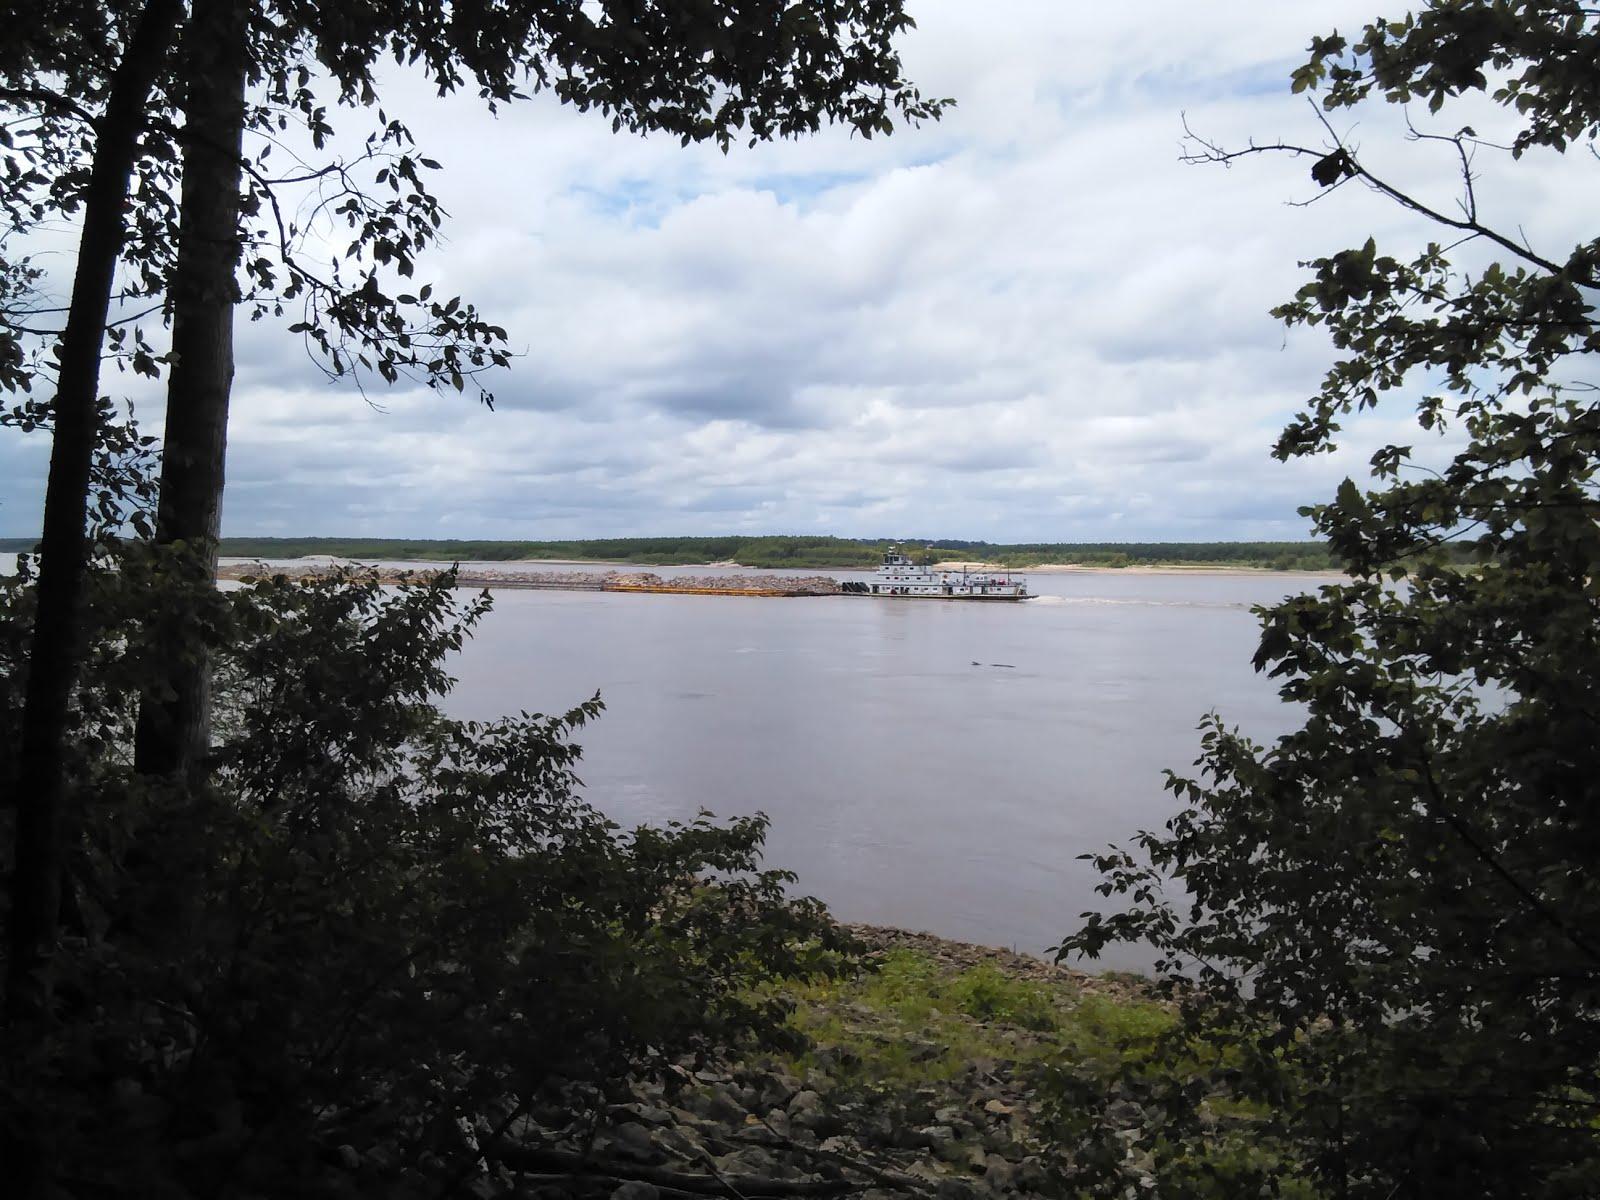 The Mississippi River